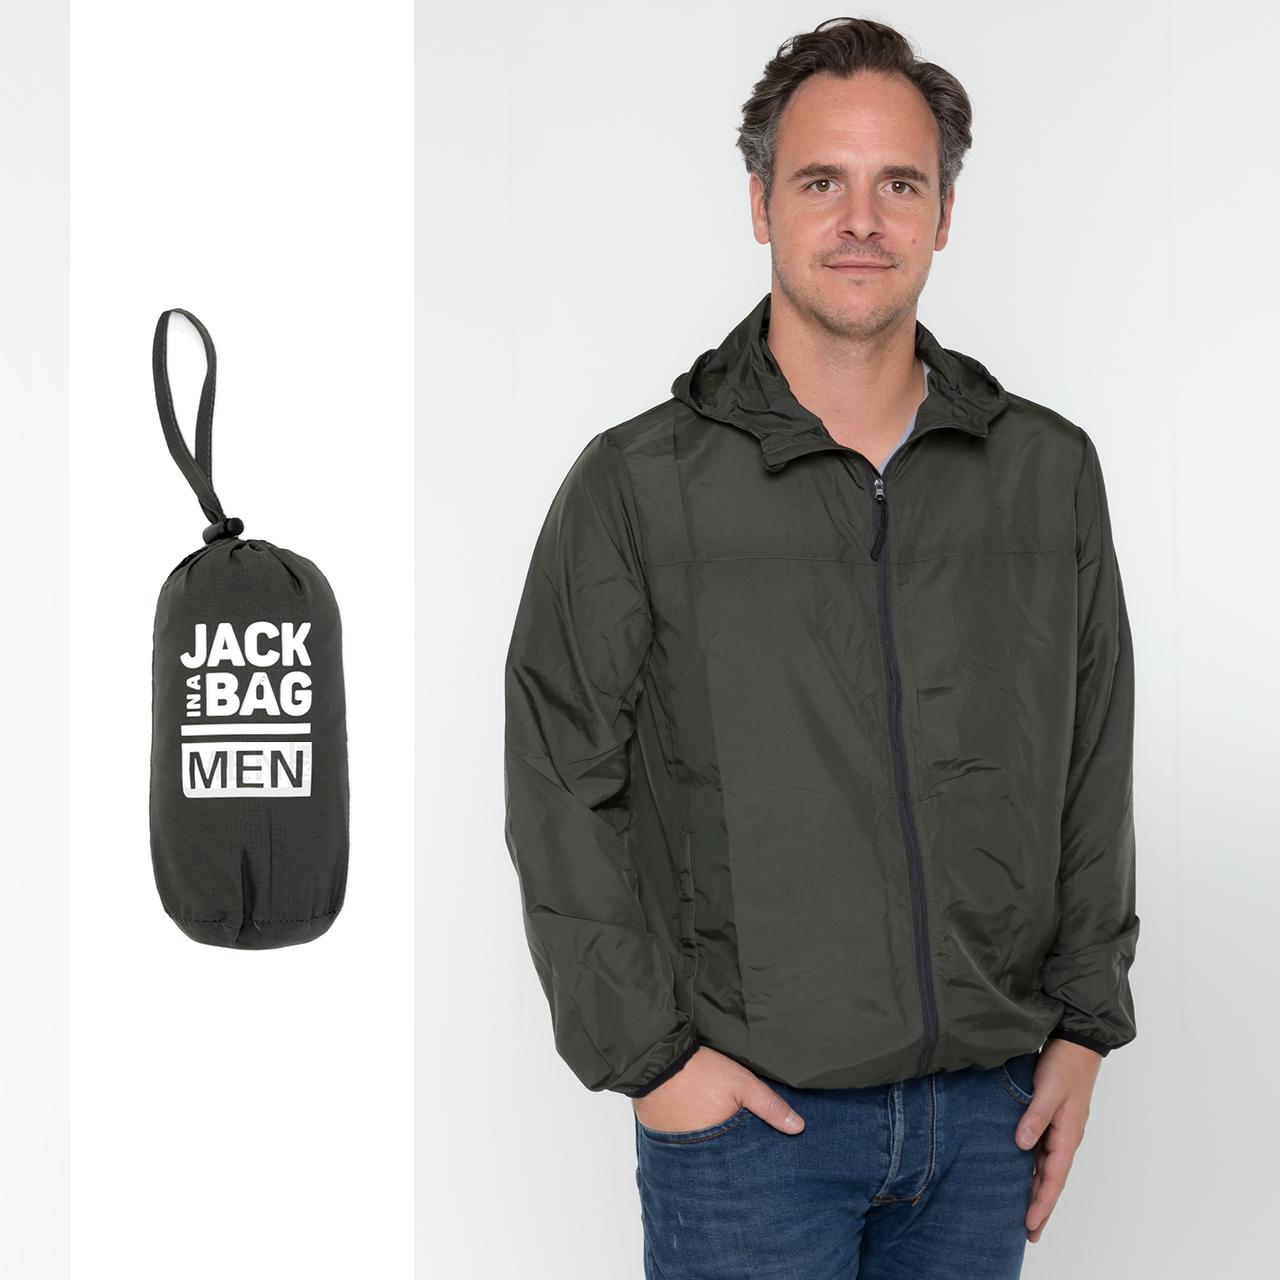 All Season Herren-Jacken in oliv